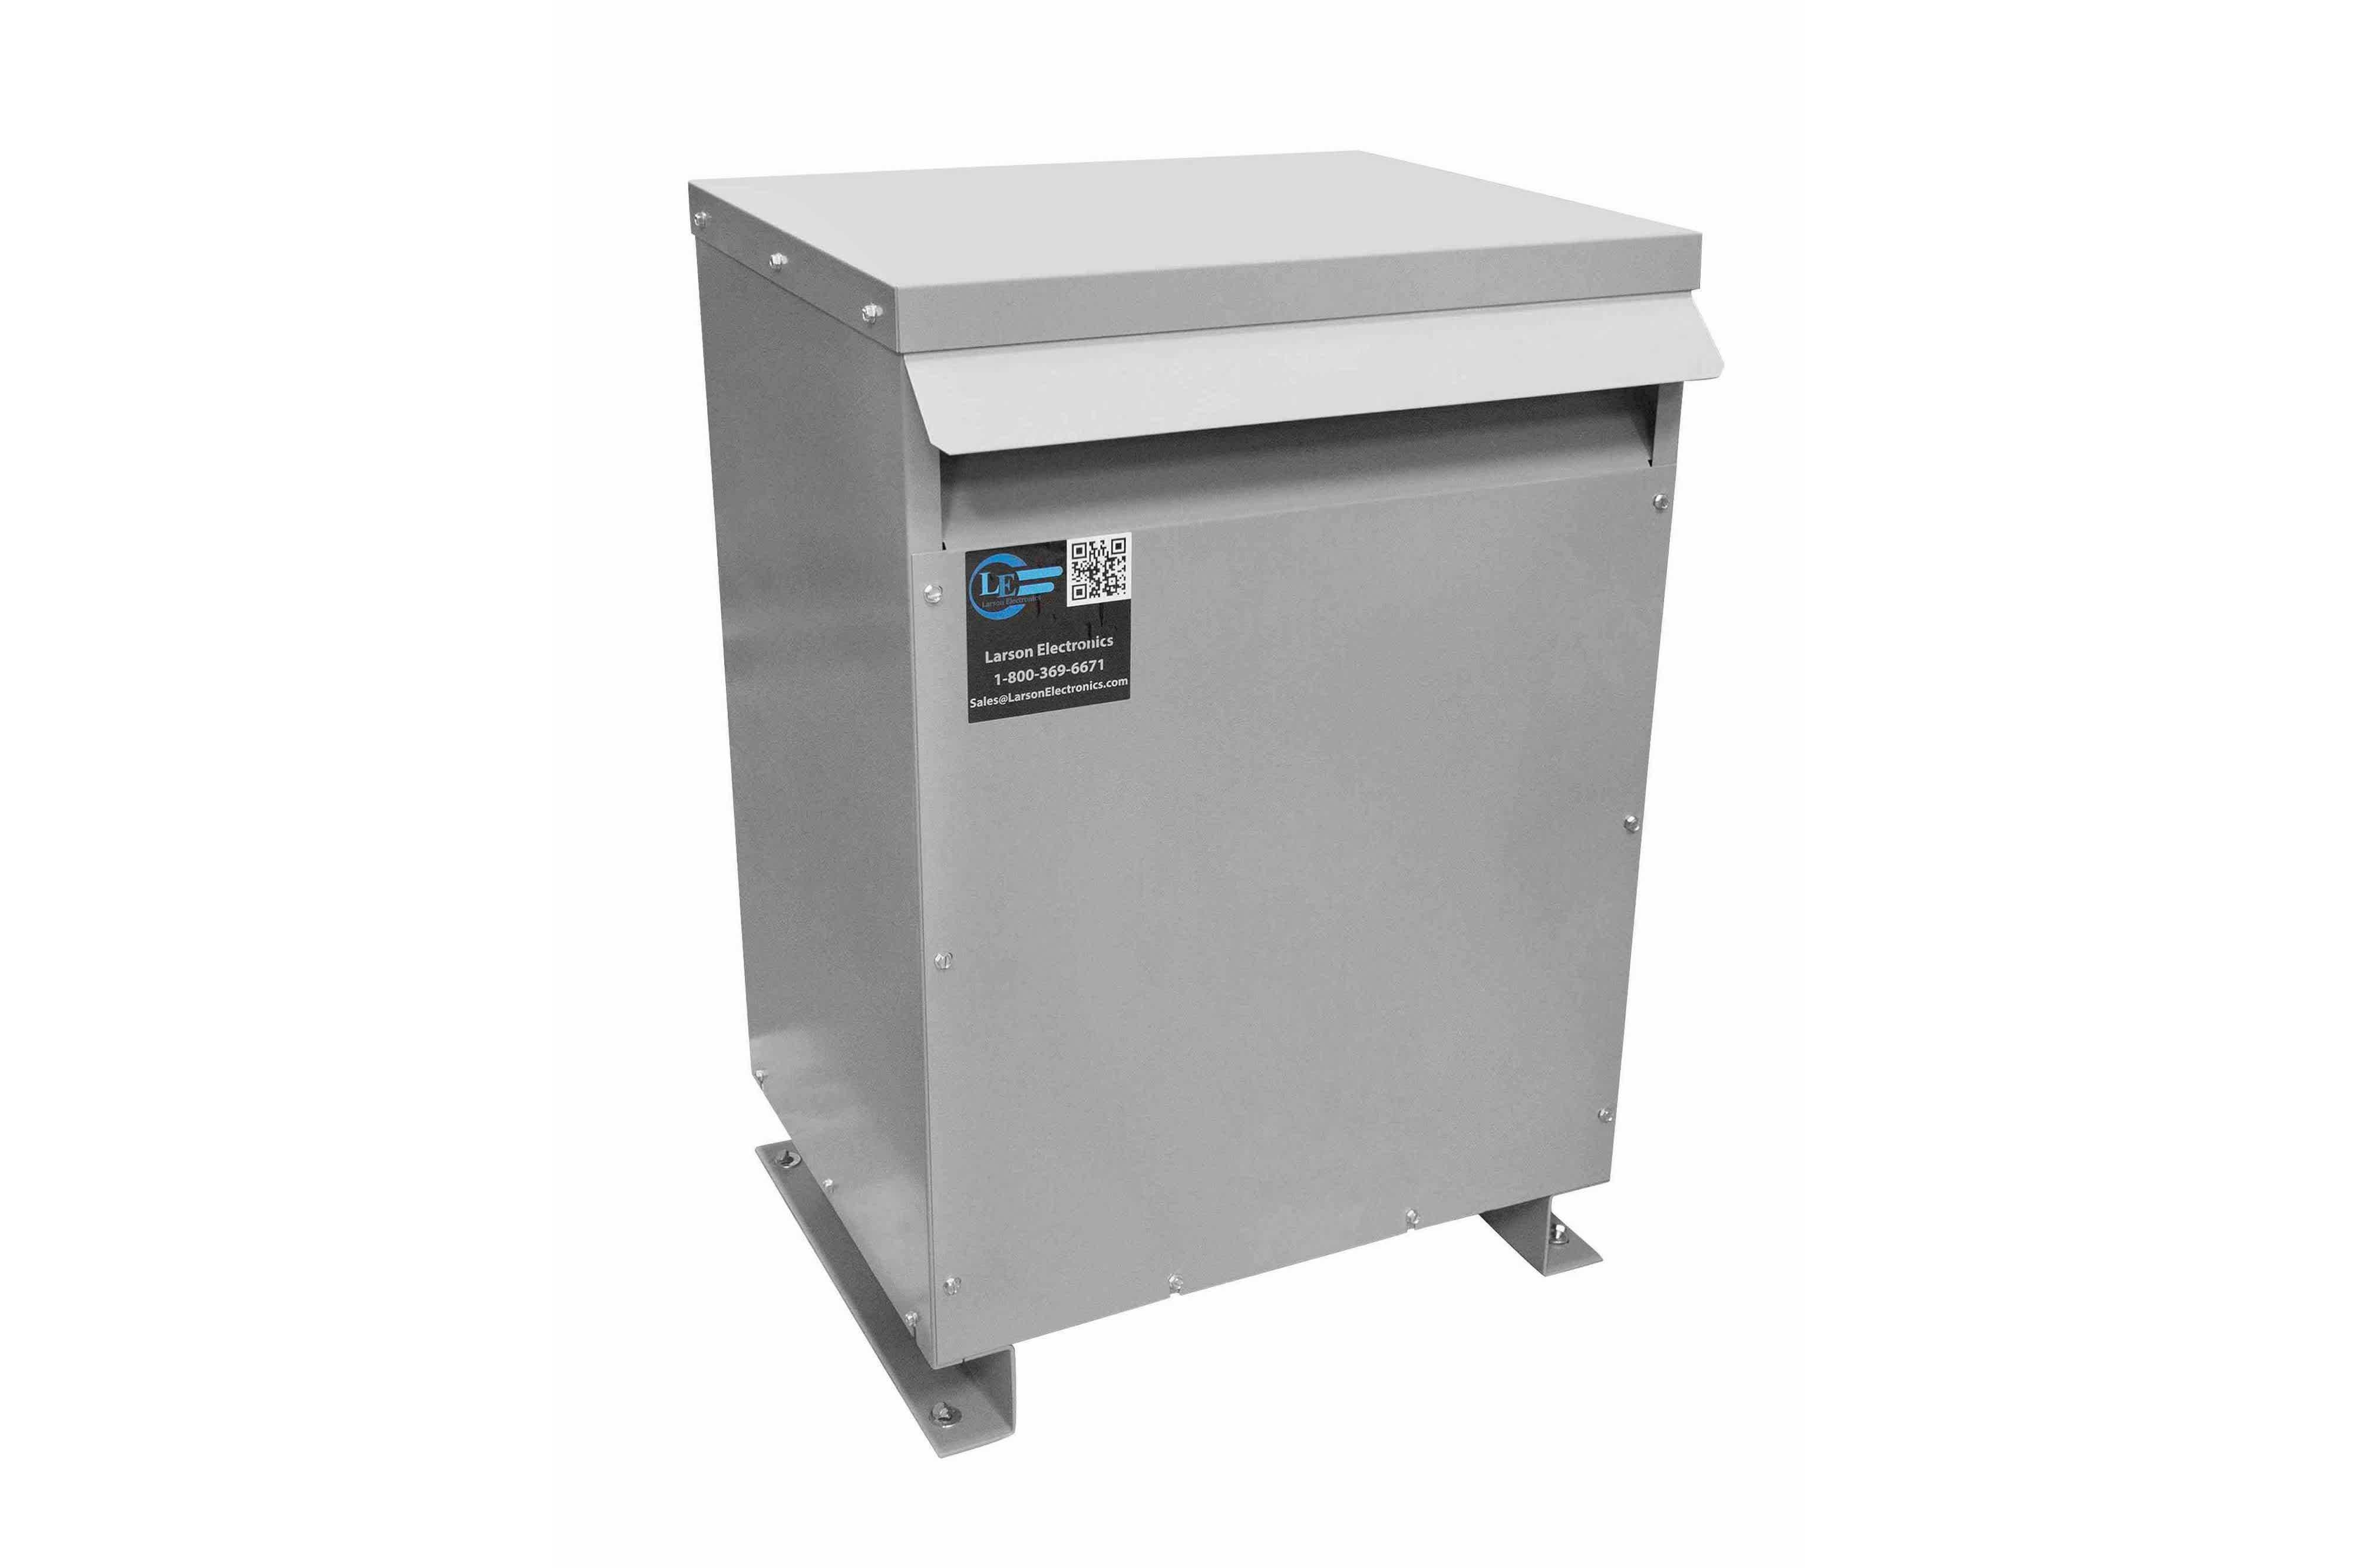 13 kVA 3PH Isolation Transformer, 460V Wye Primary, 400Y/231 Wye-N Secondary, N3R, Ventilated, 60 Hz